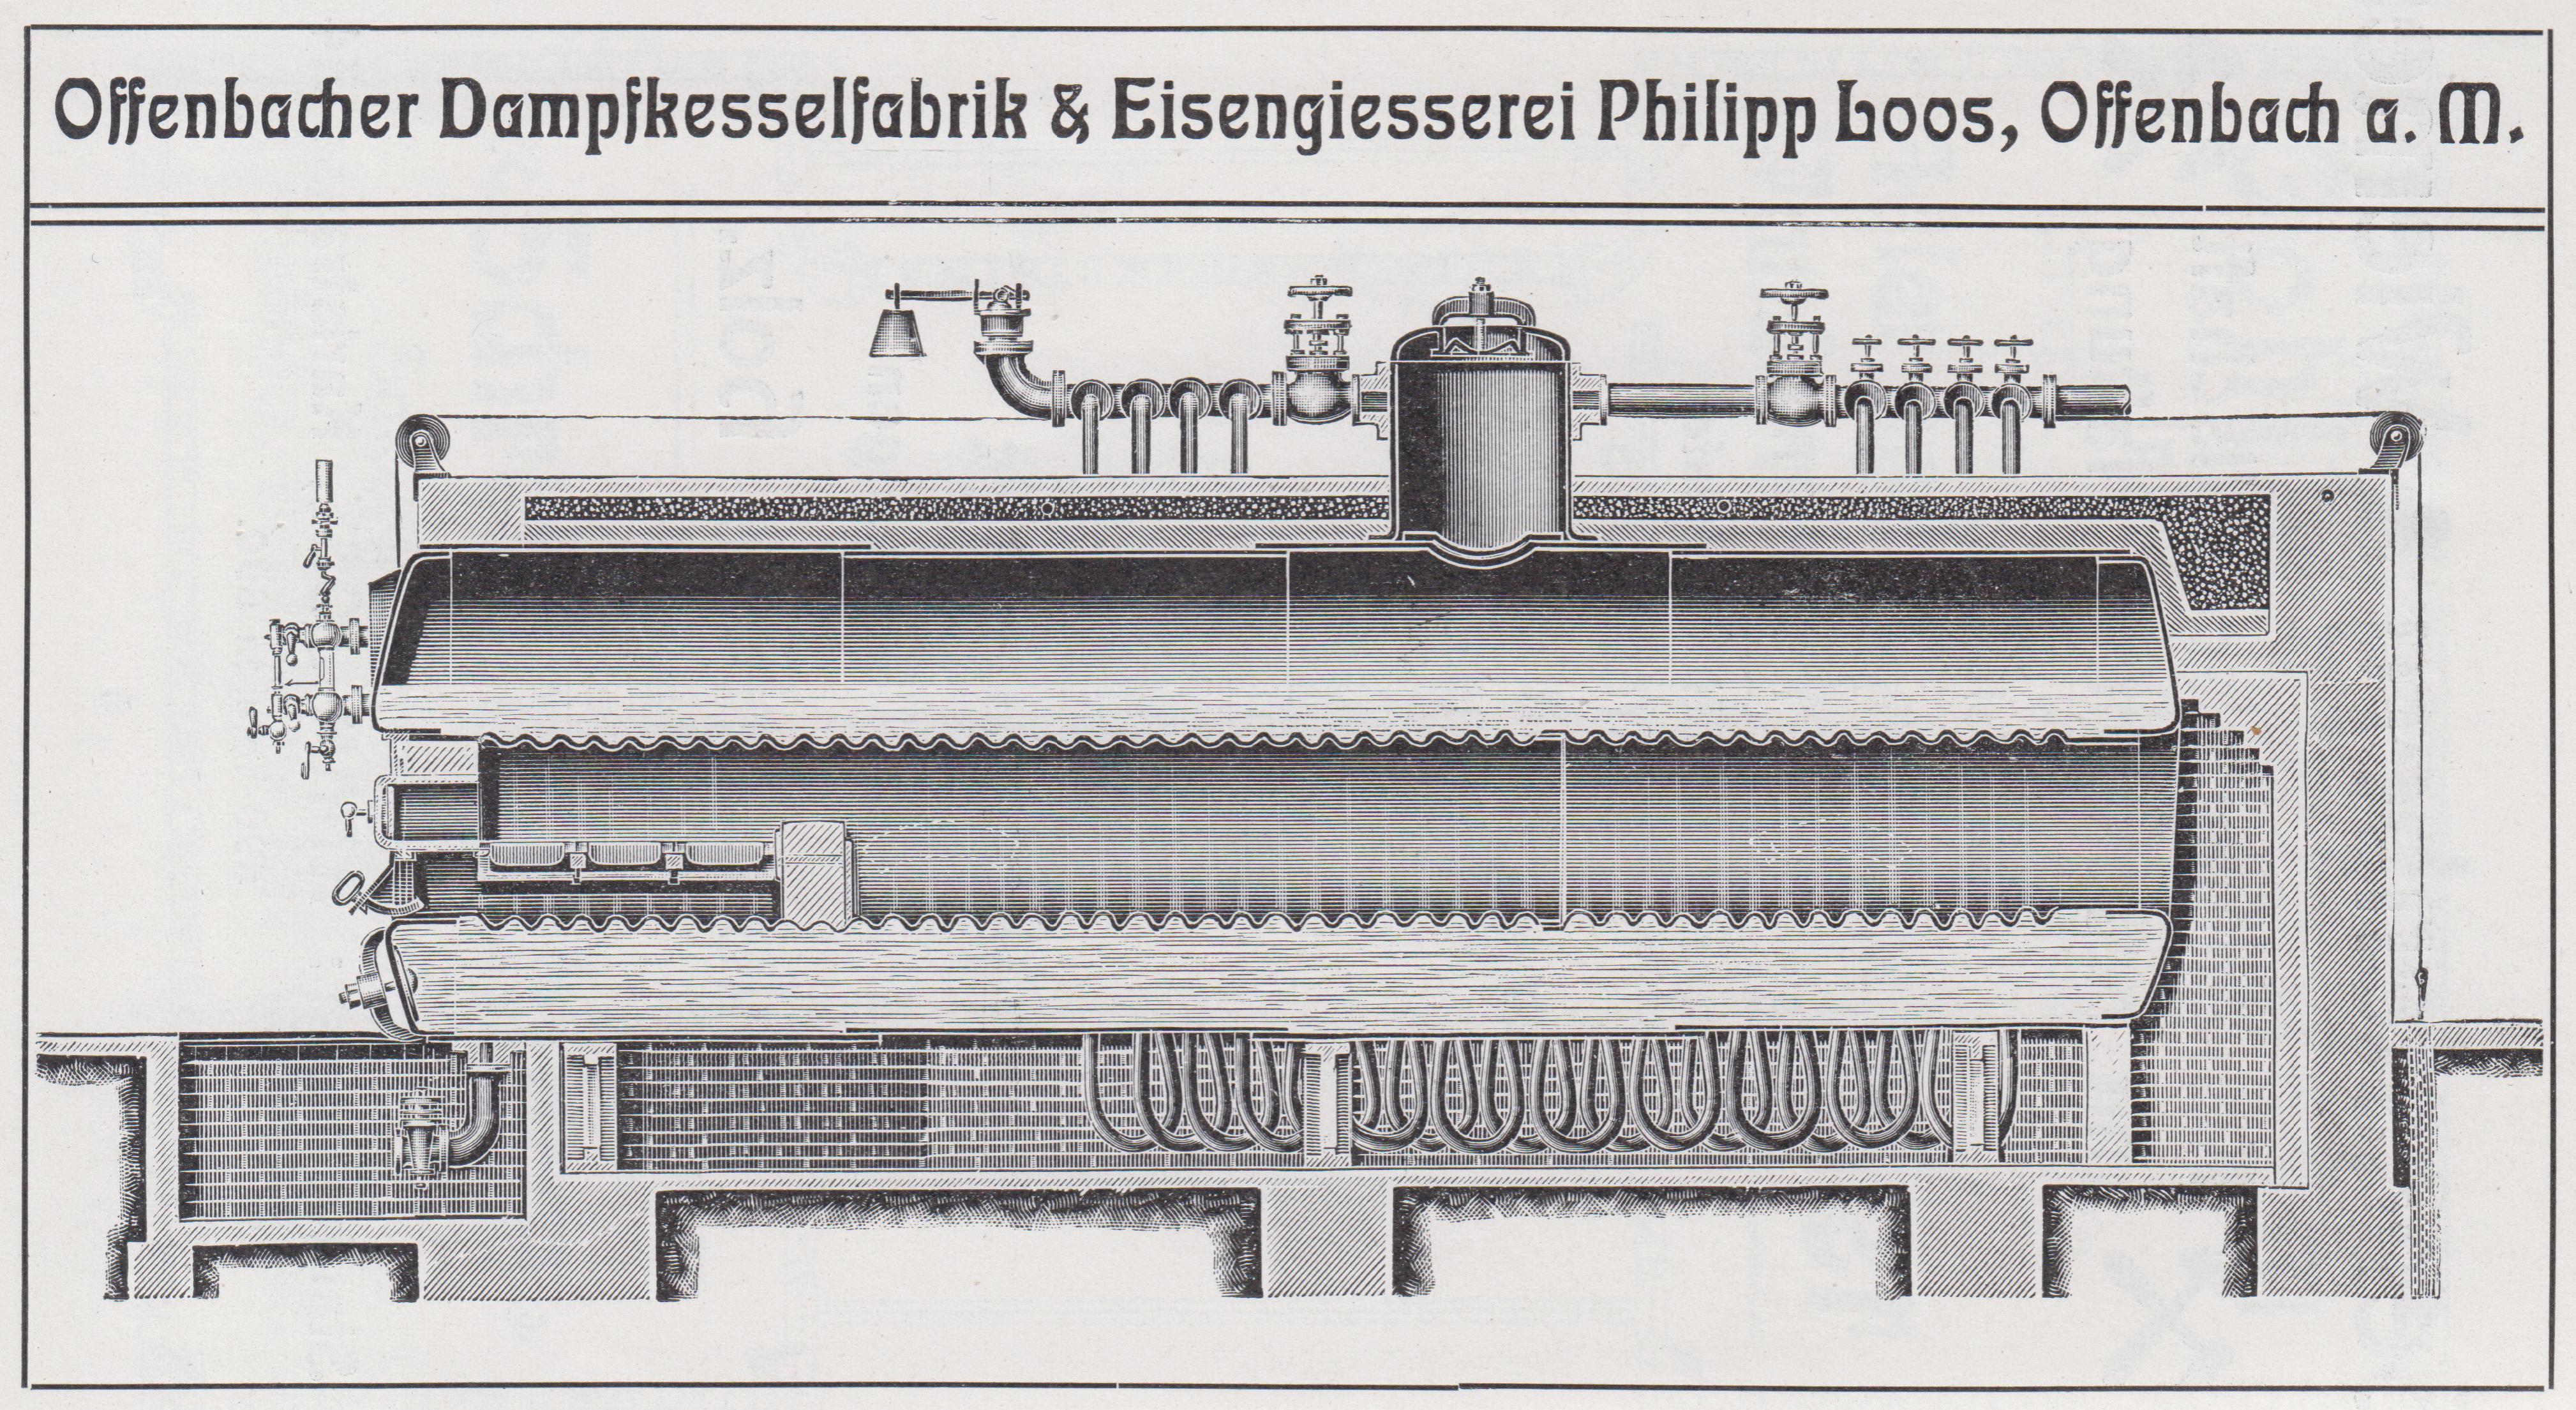 File:OF Loos Dampfkessel 1911.jpg - Wikimedia Commons